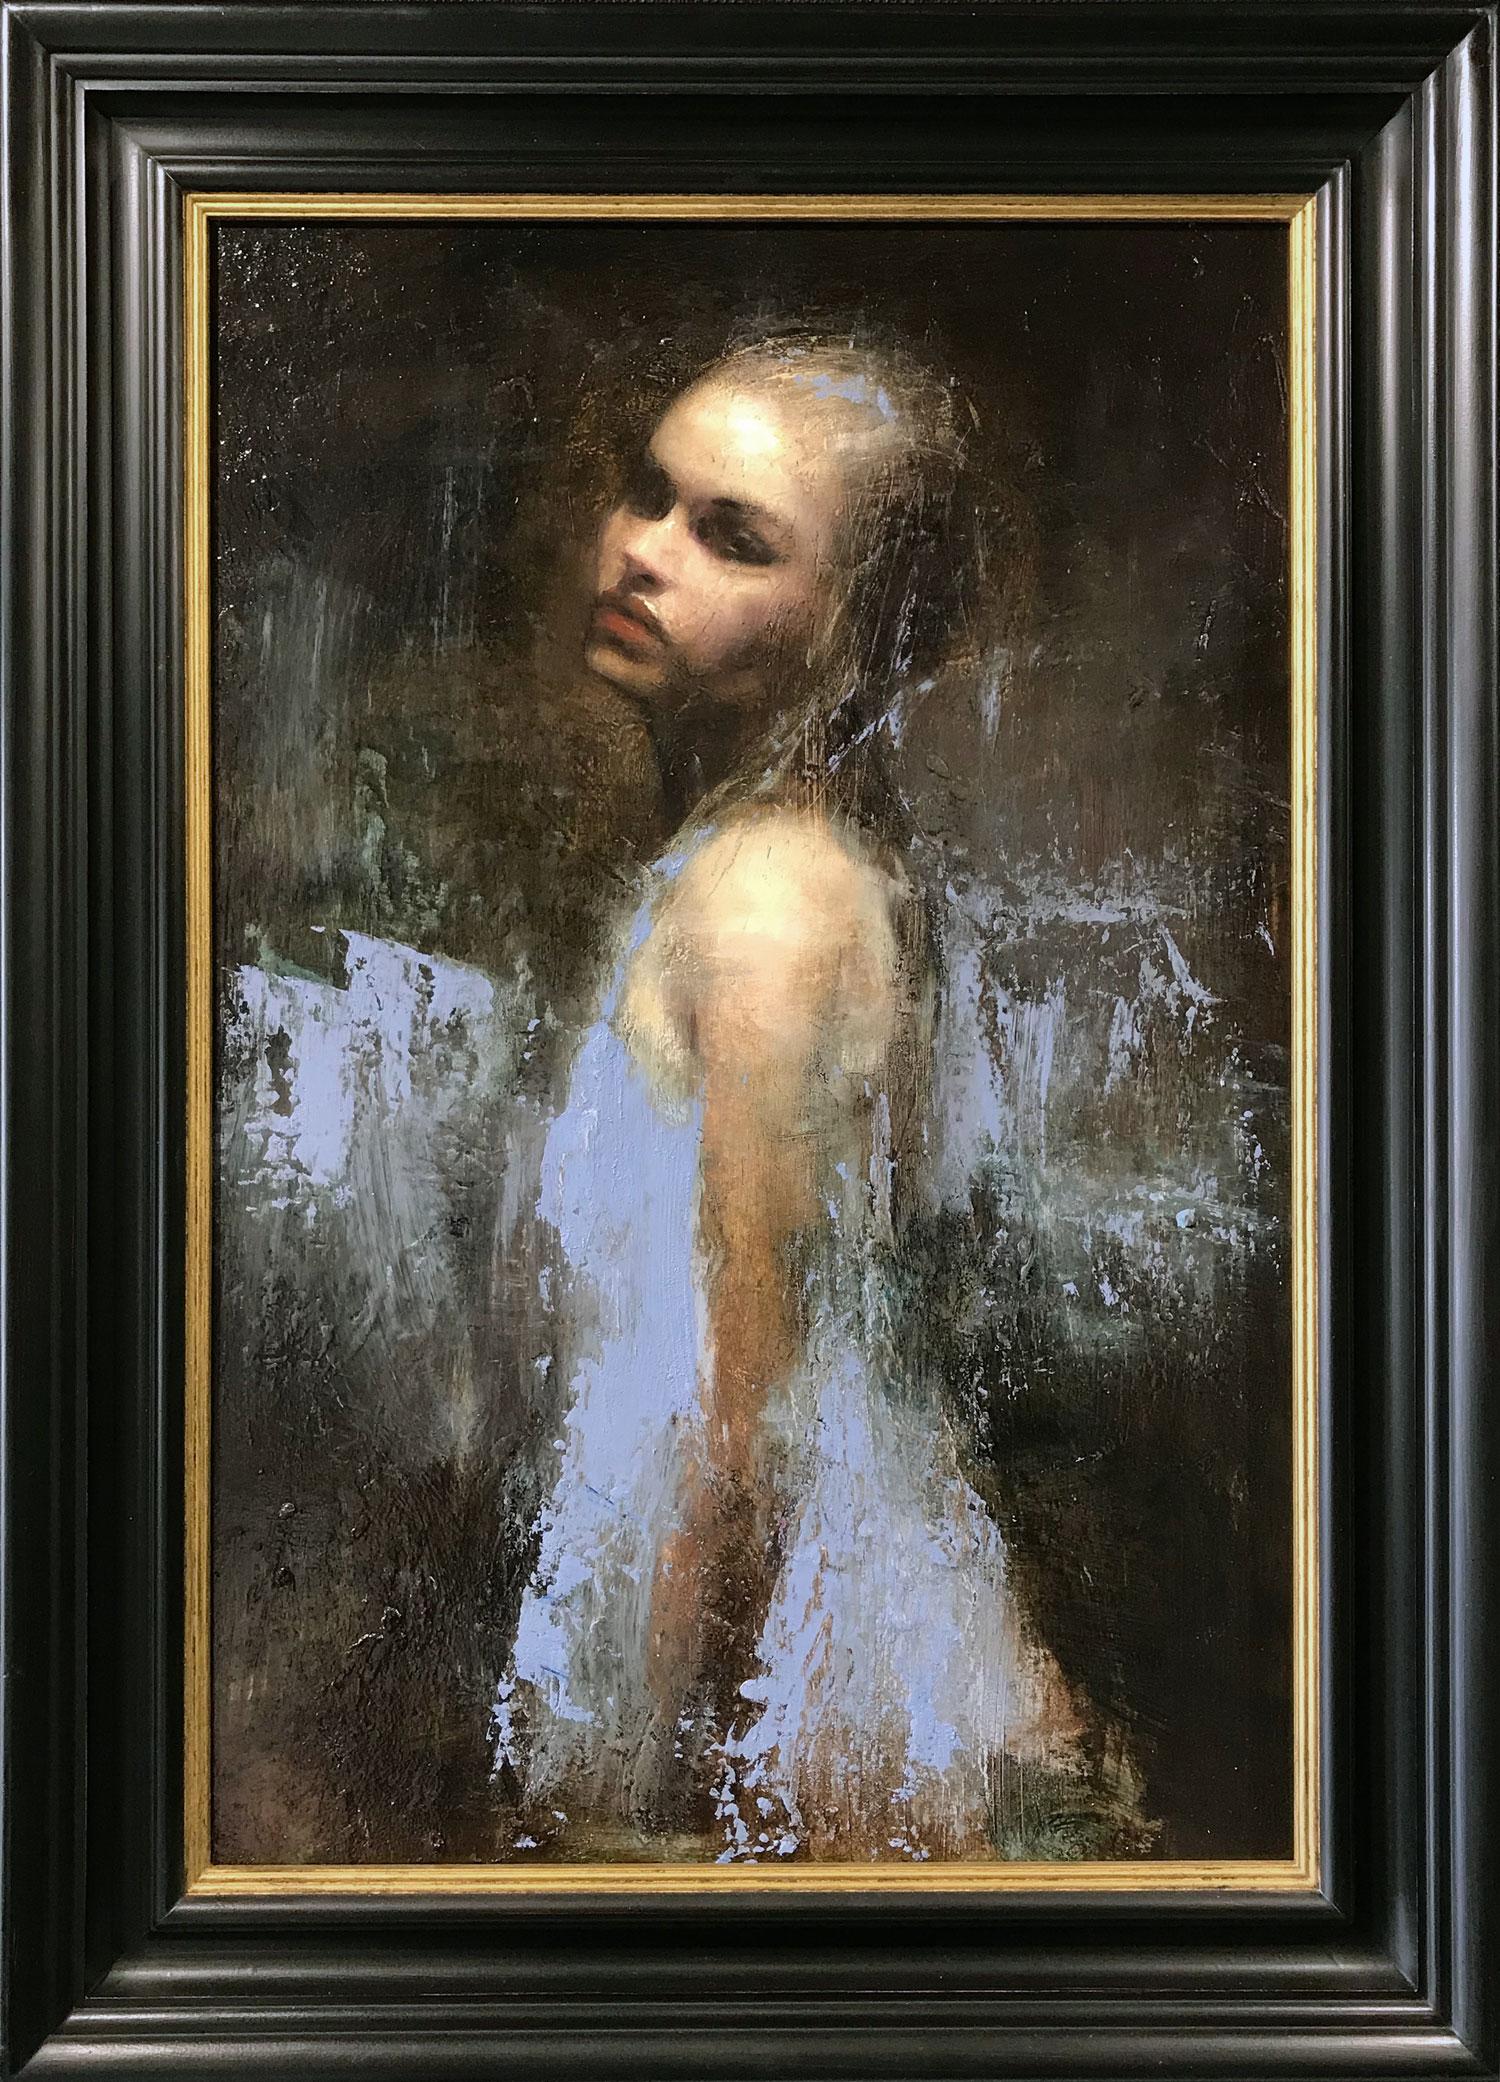 Mark Demsteader Chloe Study in Blue Original Oil Painting